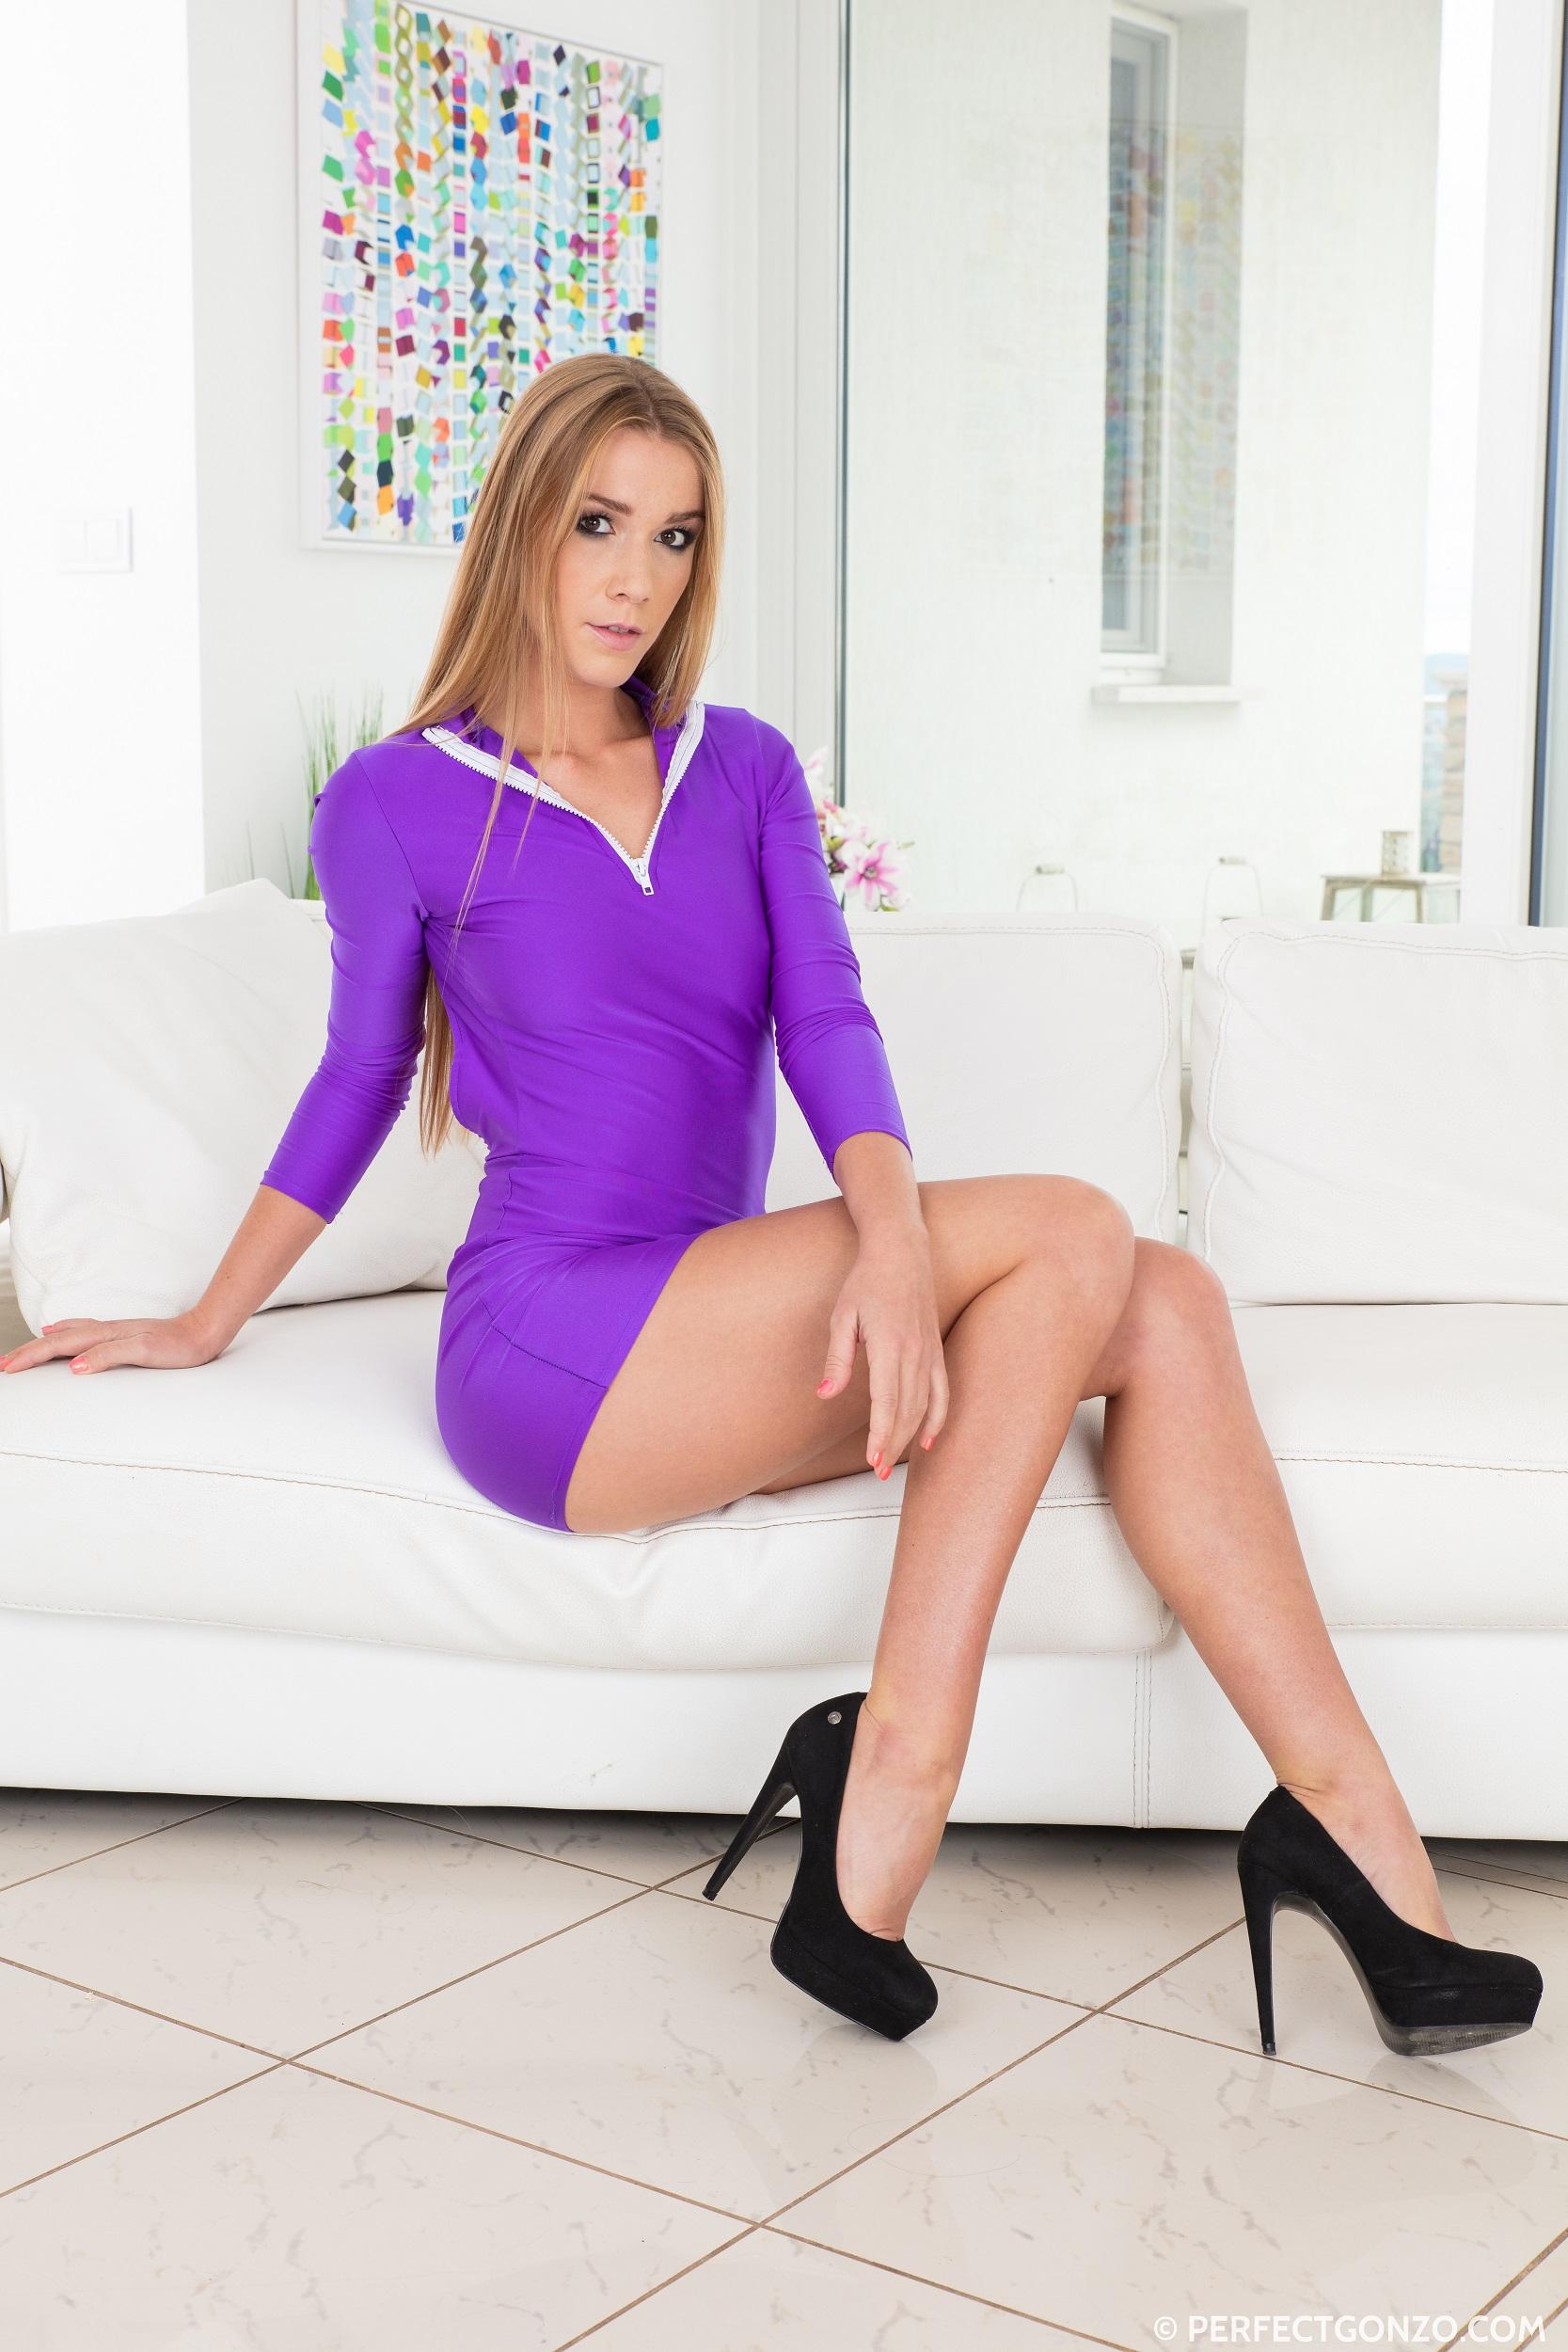 Alexis Crystal, pornstar, women, legs, Perfect Gonzo